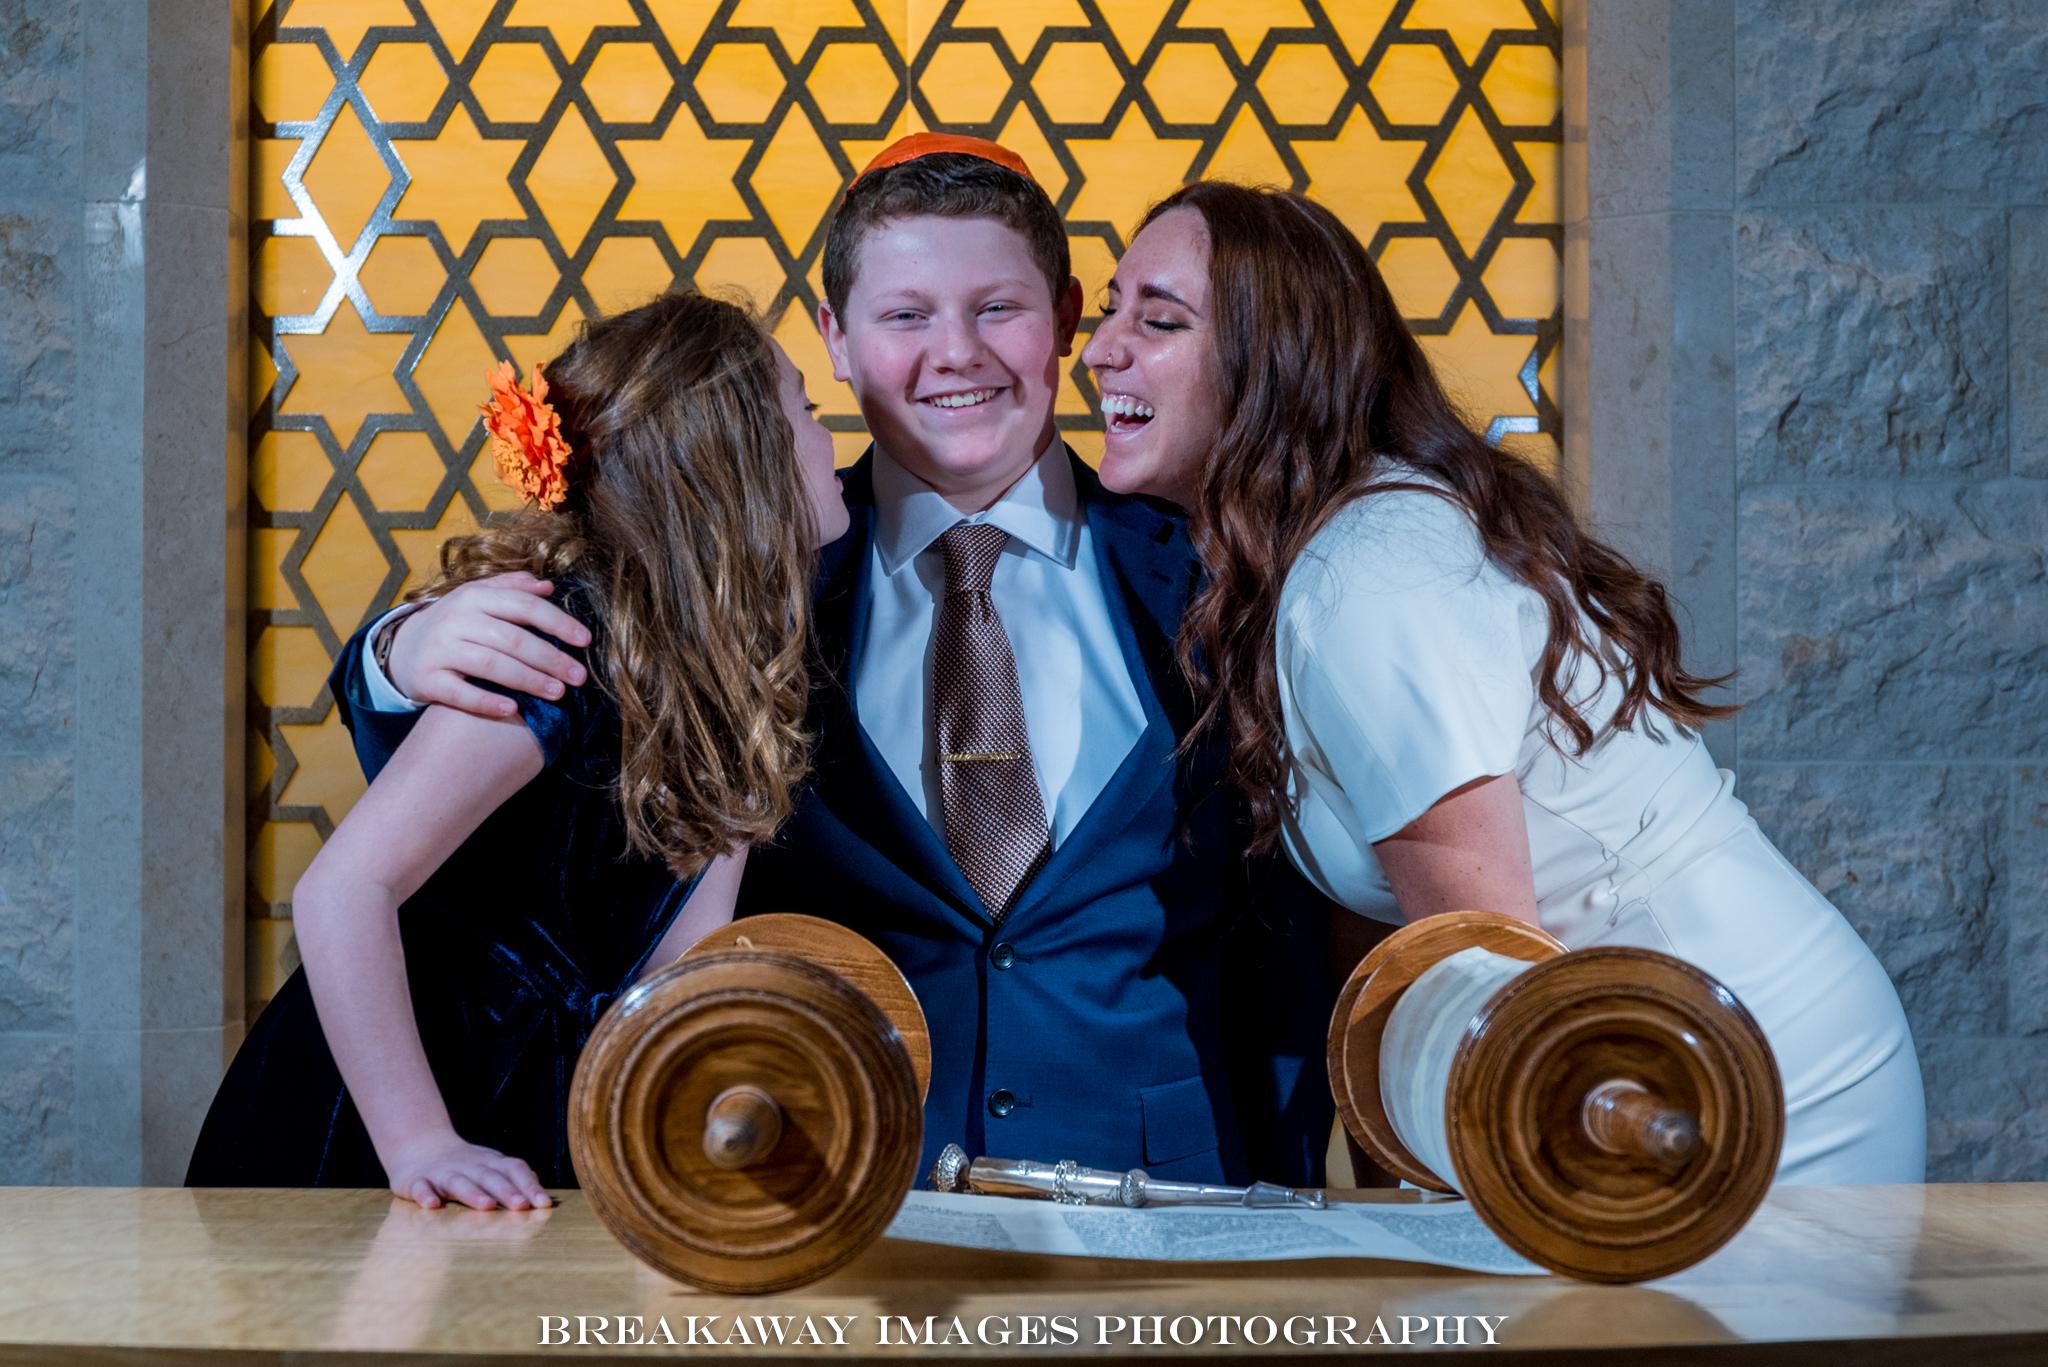 Matthew Levithan Bar Mitzvah 2019-01-19 v-24.jpg